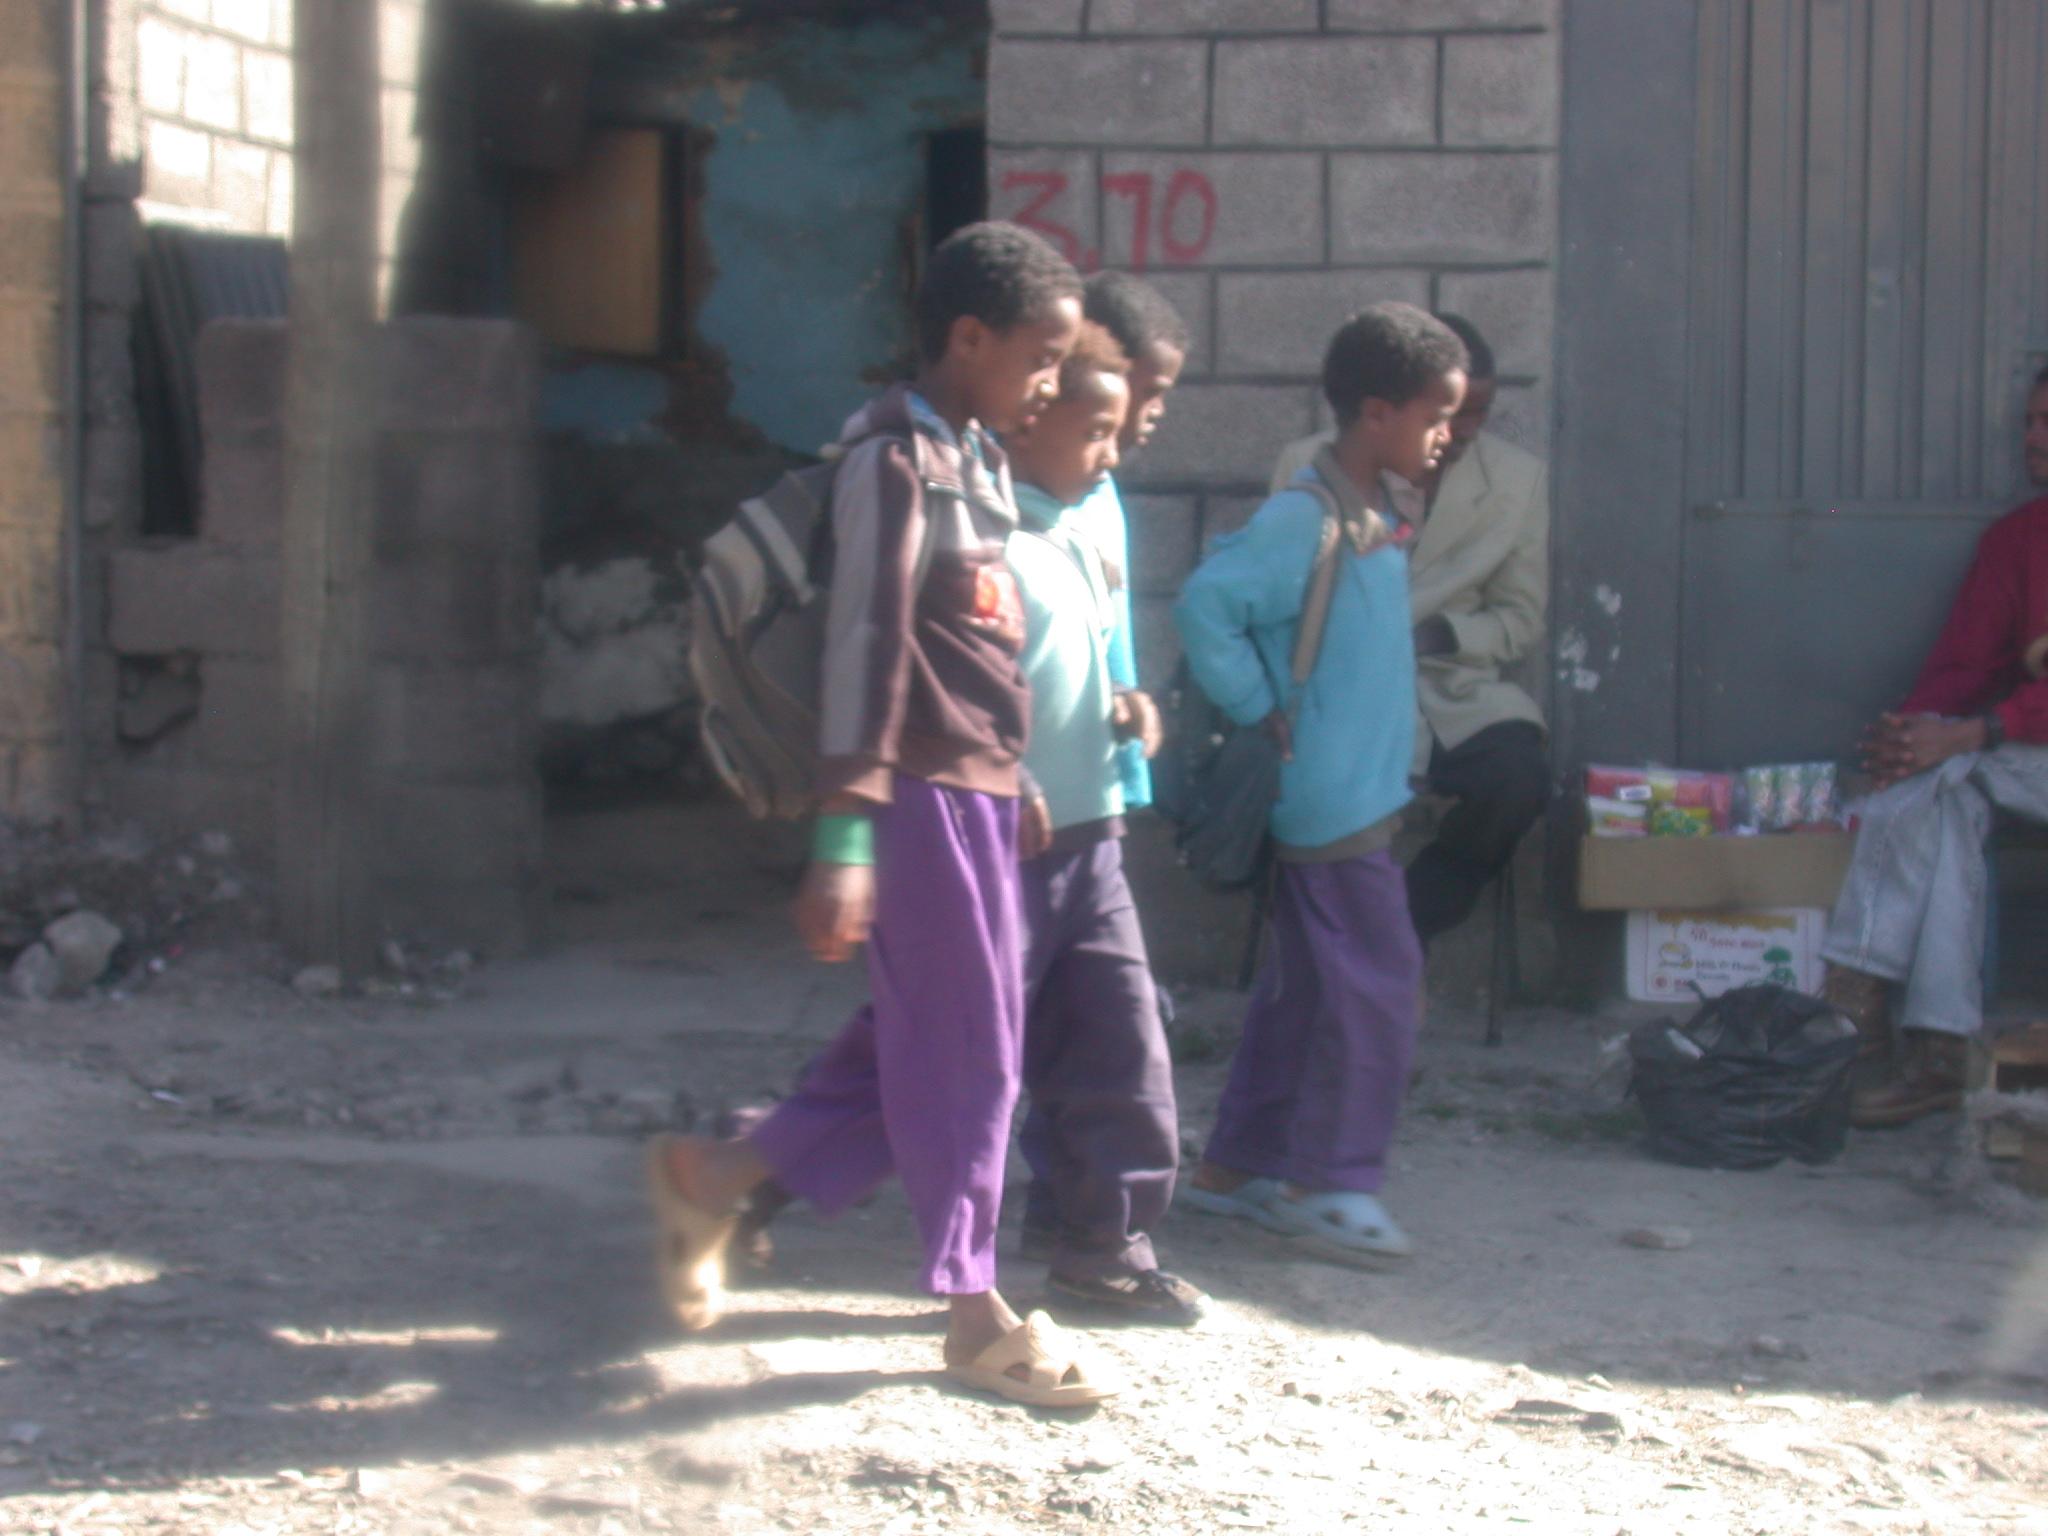 Schoolchildren Walking Home on the Streets of Addis Ababa, Ethiopia